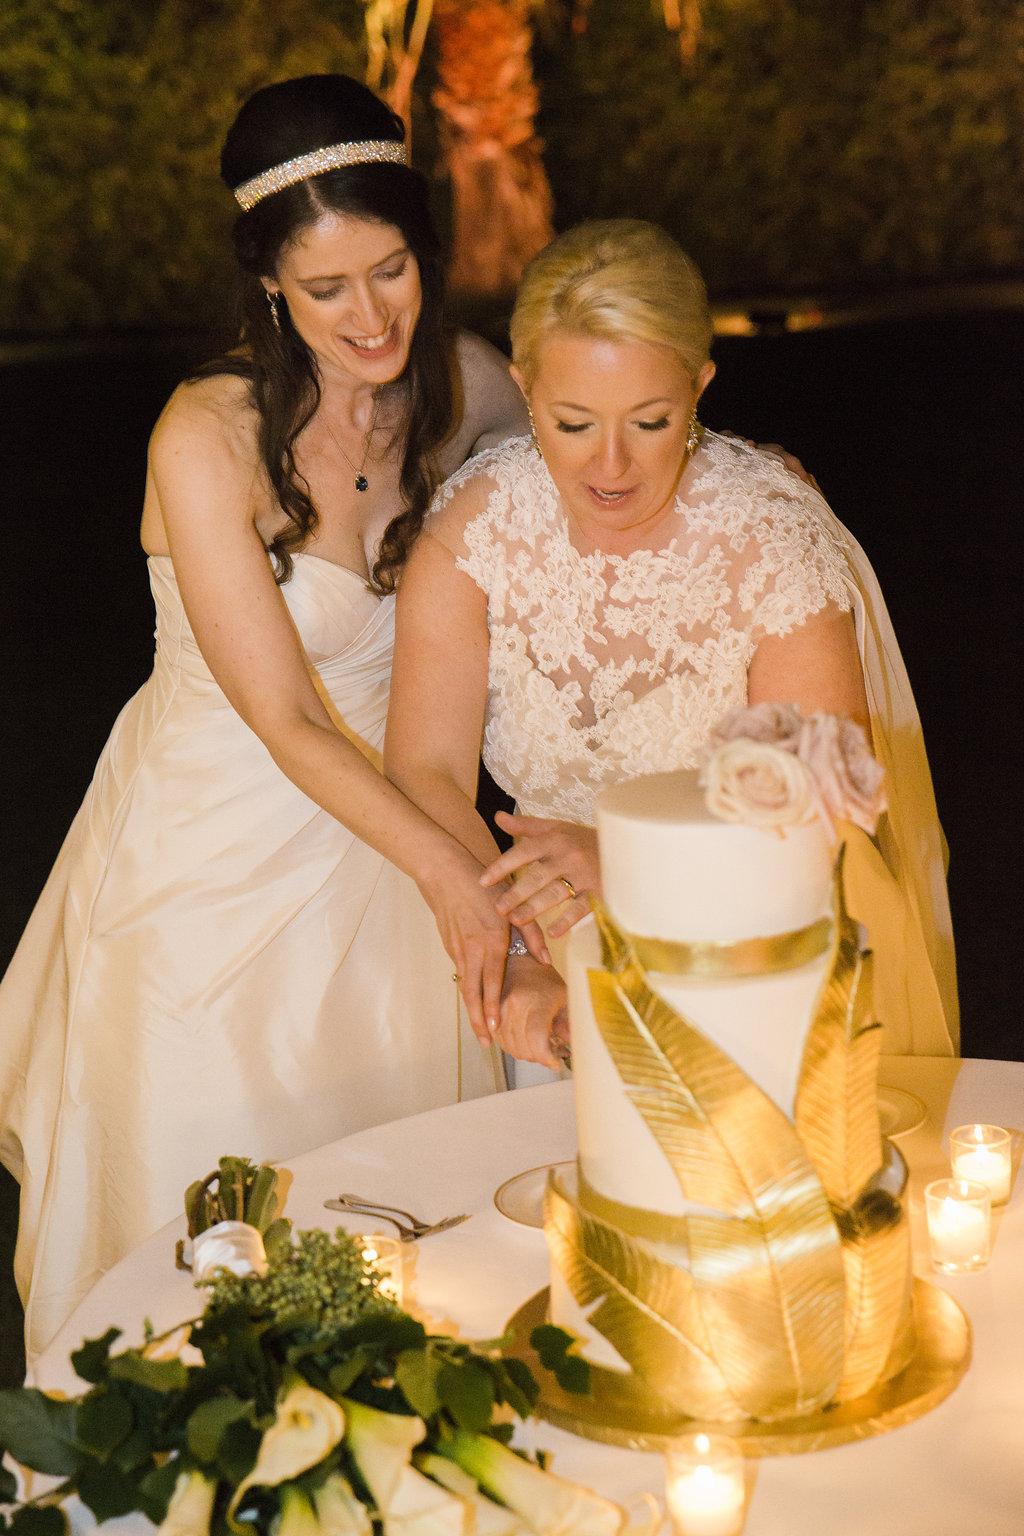 610-carren-courtney-wedding-parker-palm.jpg